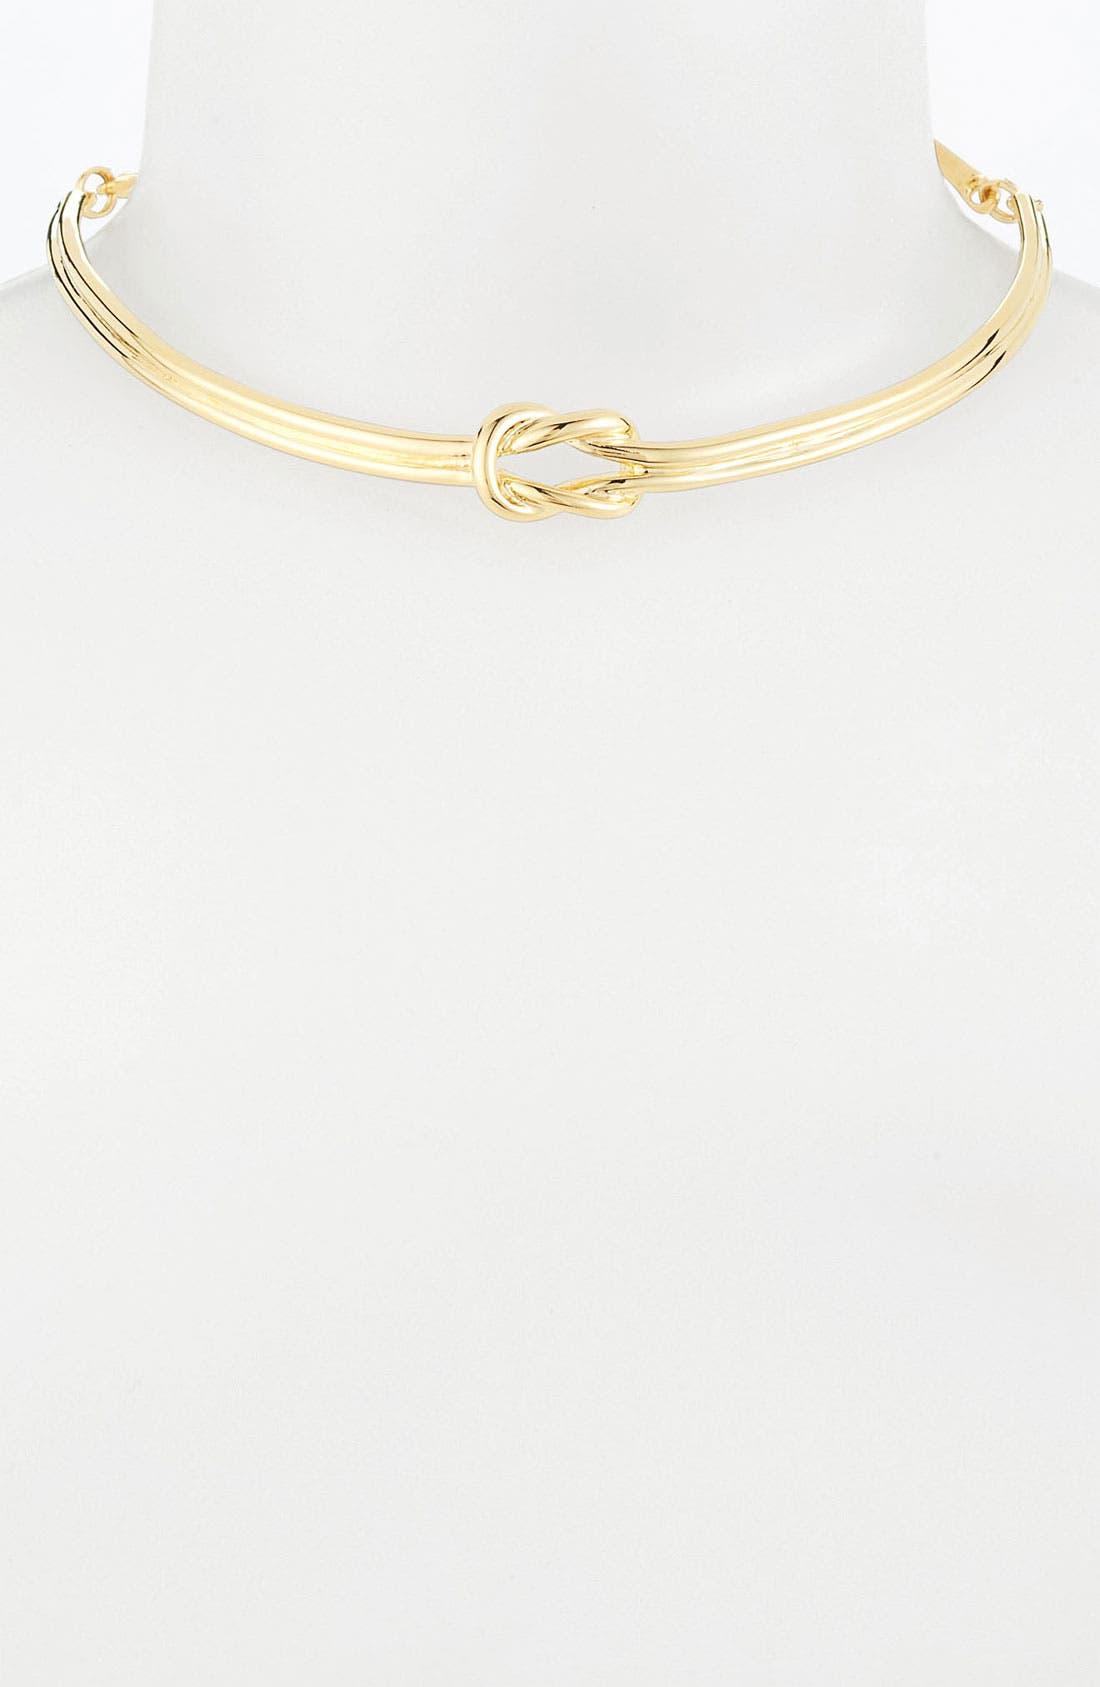 Alternate Image 1 Selected - Tory Burch 'Hercules' Collar Necklace